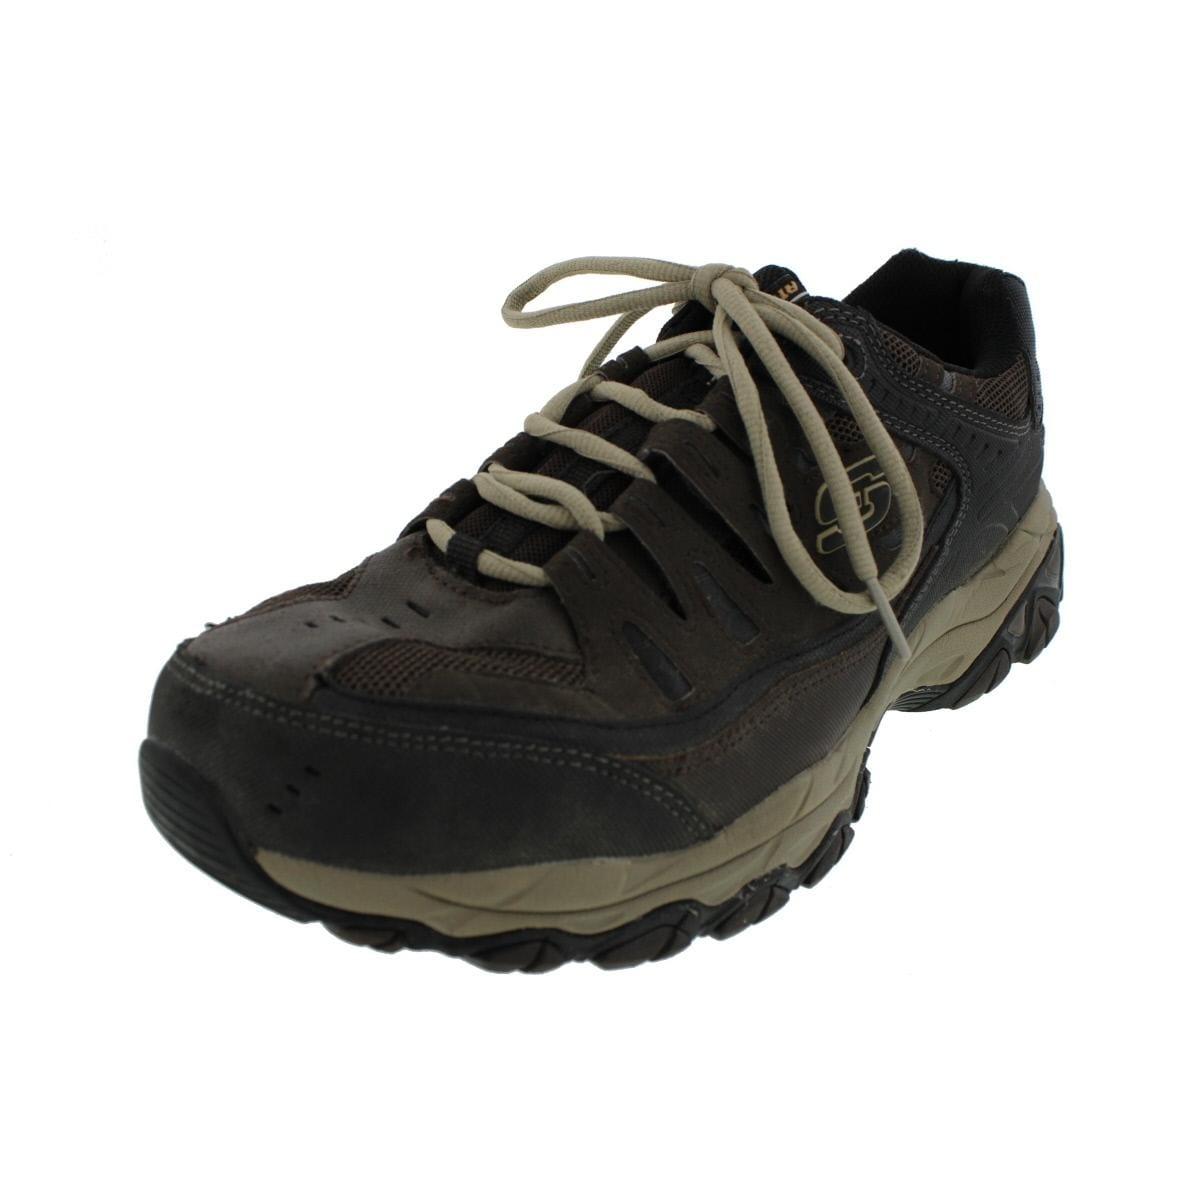 94c623b8cd4 Skechers Mens After Burn Casual Shoes Leather Memory Foam